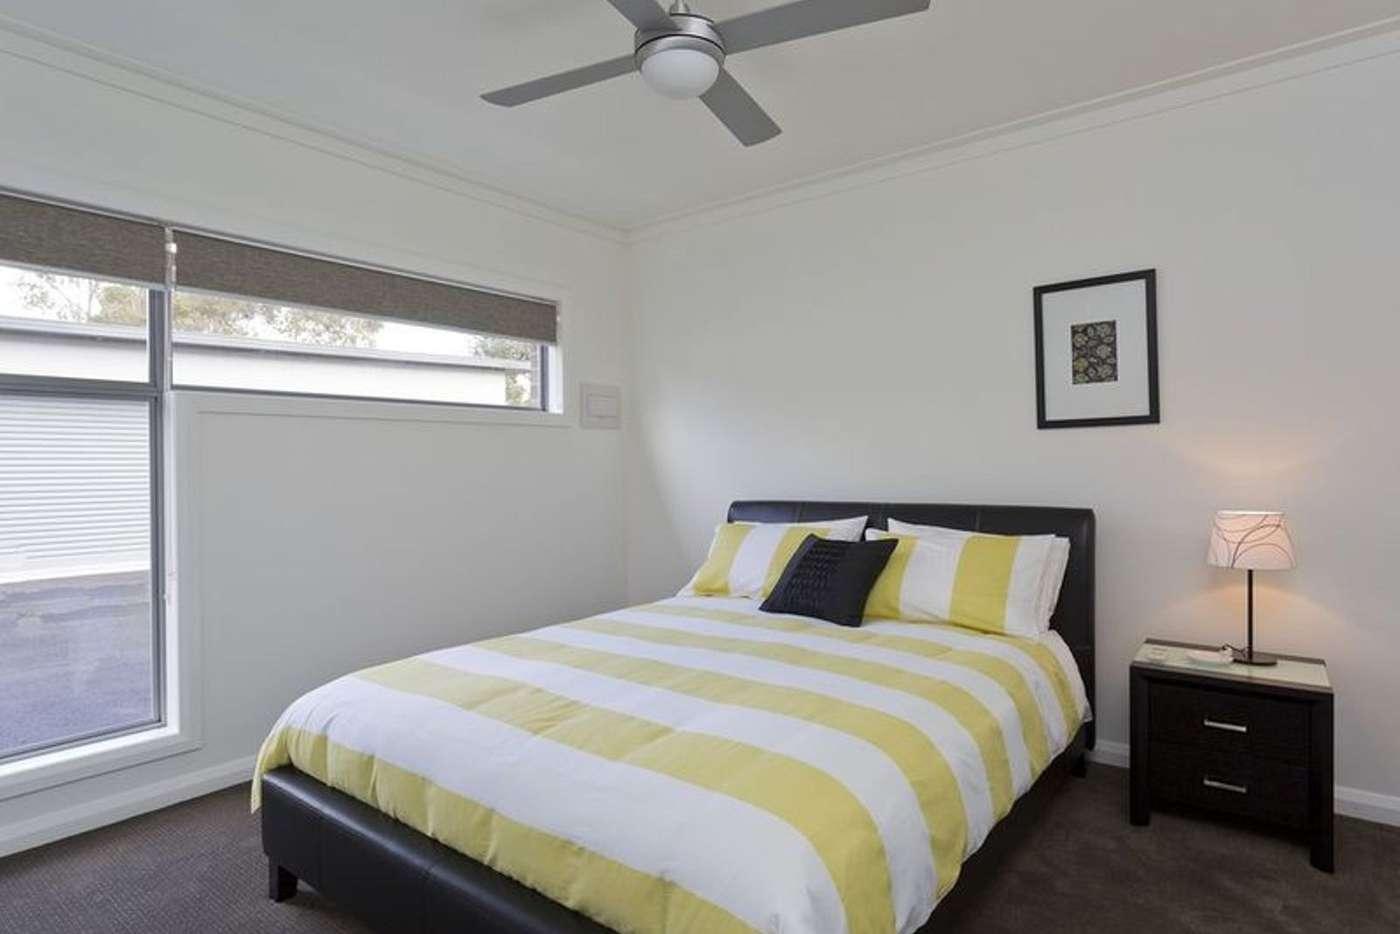 Seventh view of Homely house listing, 4/17 Bobs Street, Bendigo VIC 3550